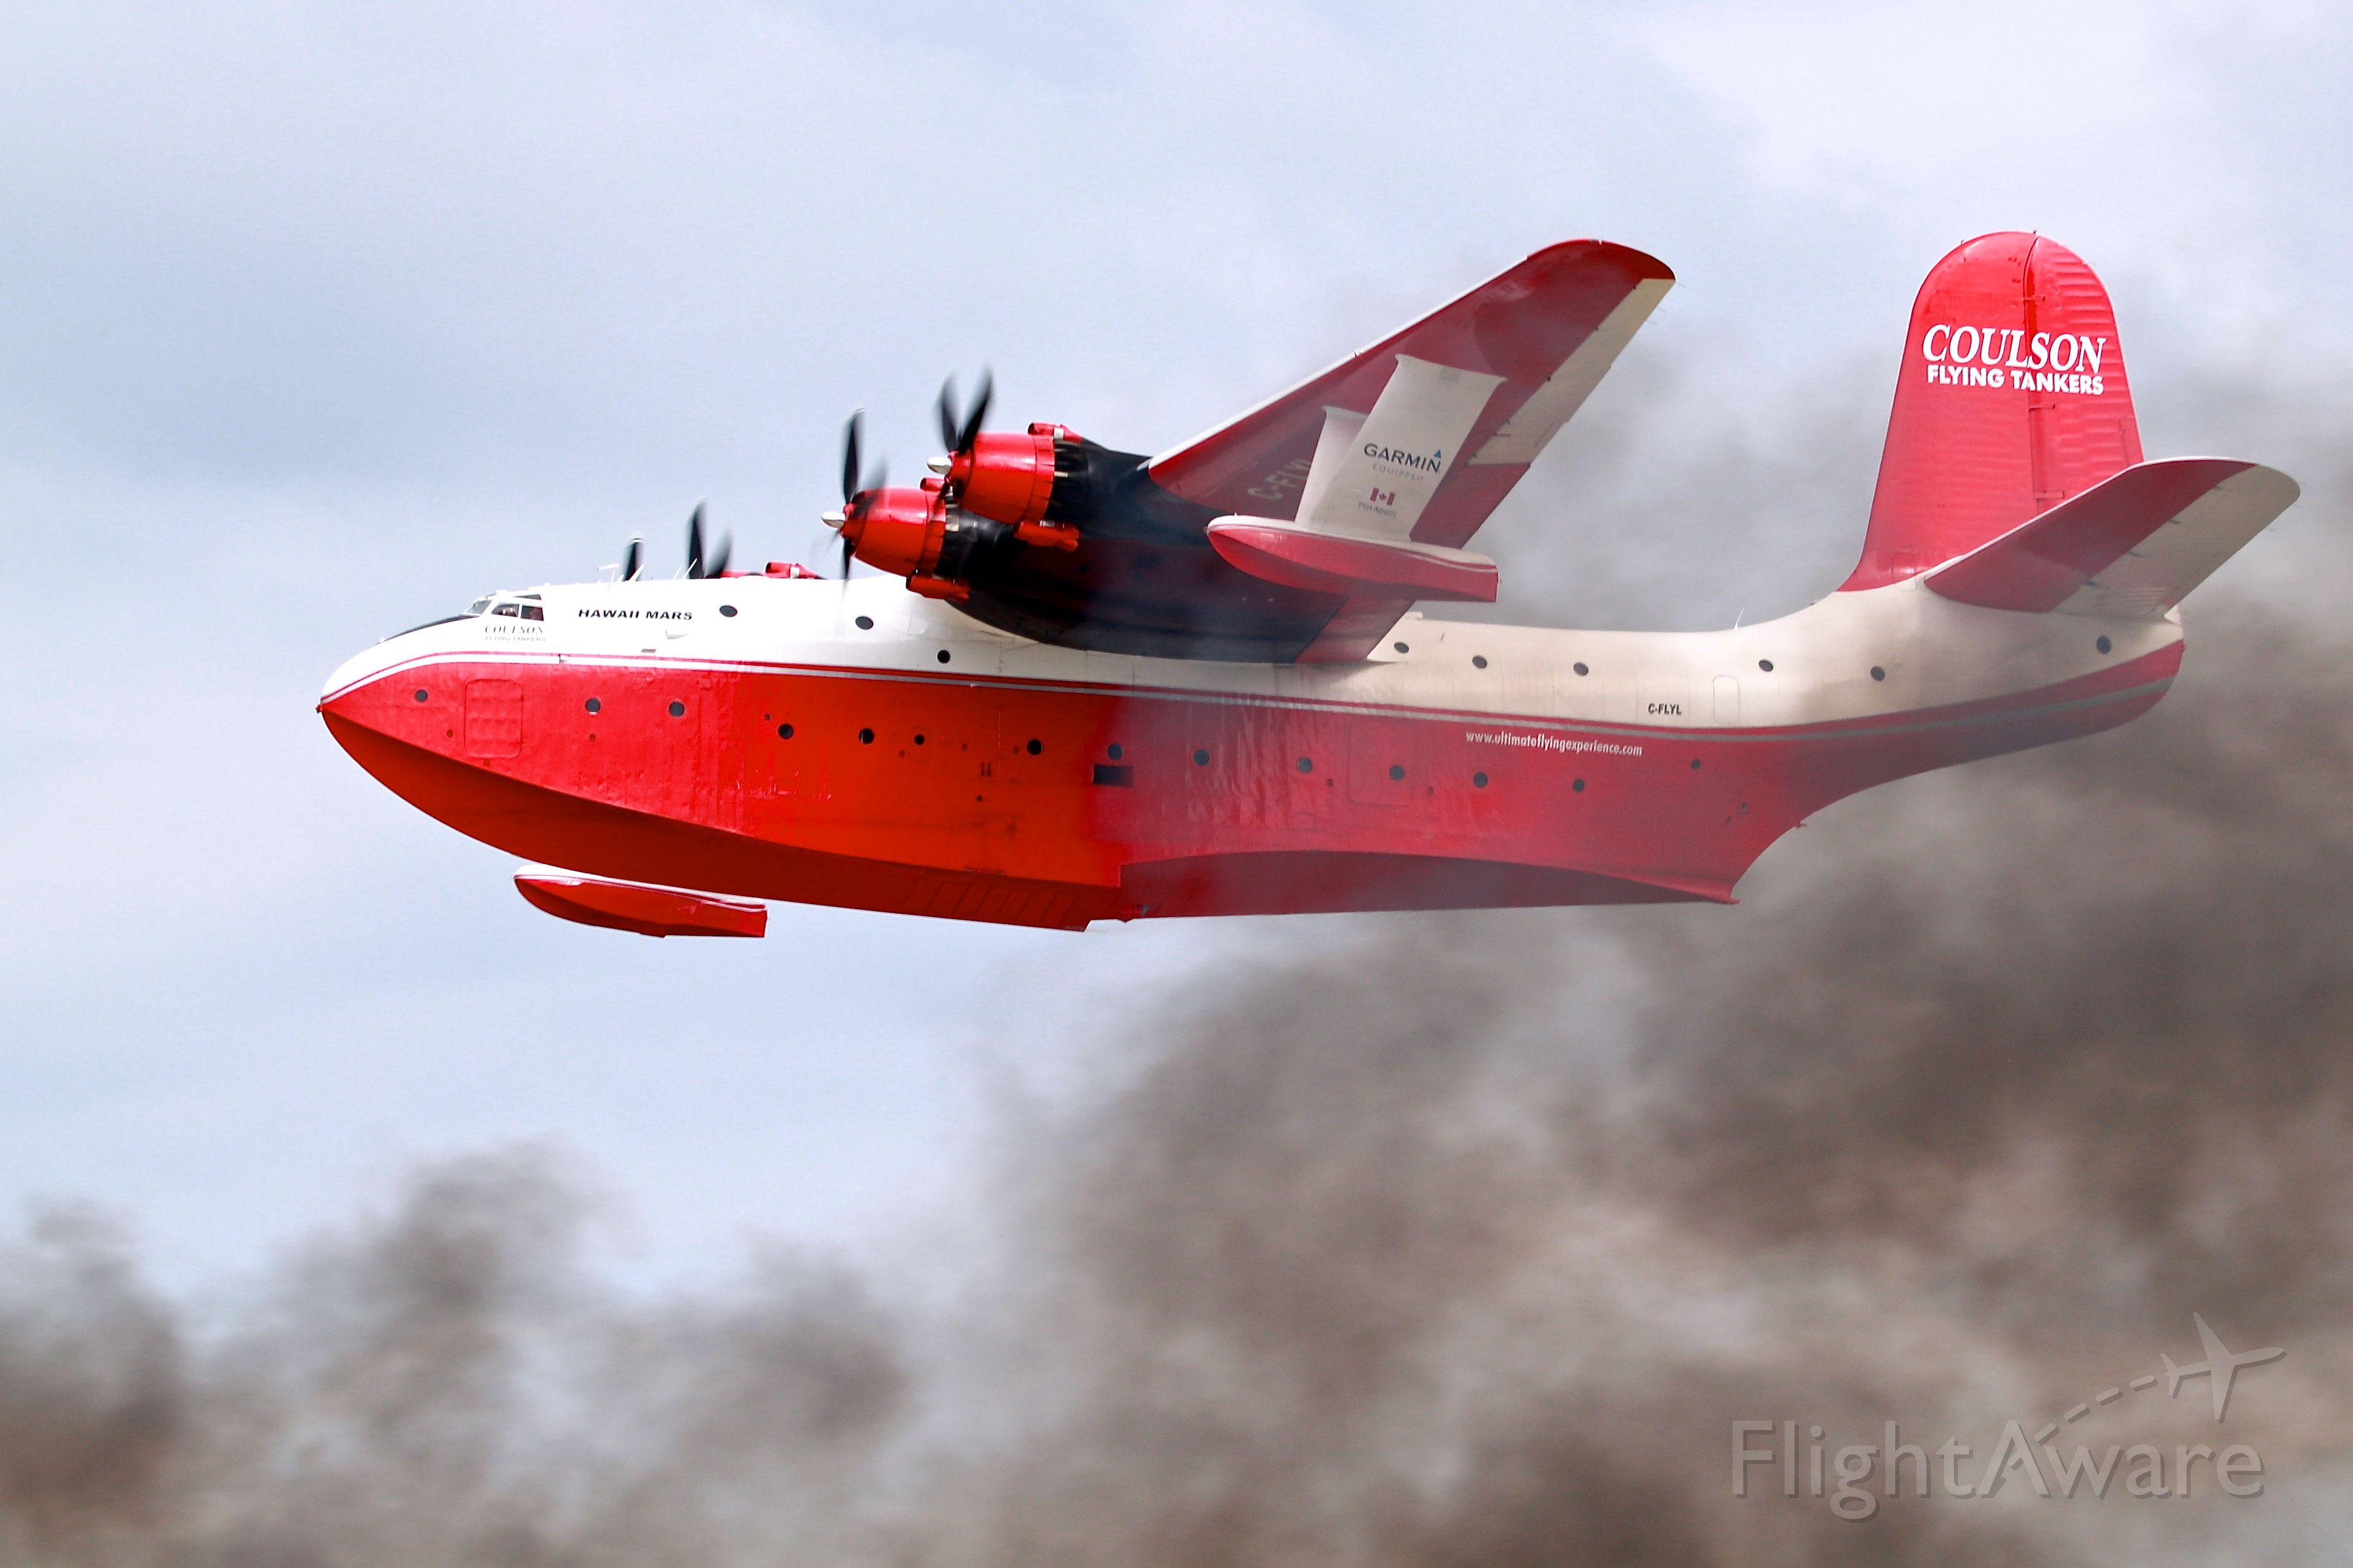 MARTIN Mars (C-FLYL) - Martin Mars waterbomber flyby at Oshkosh on Friday